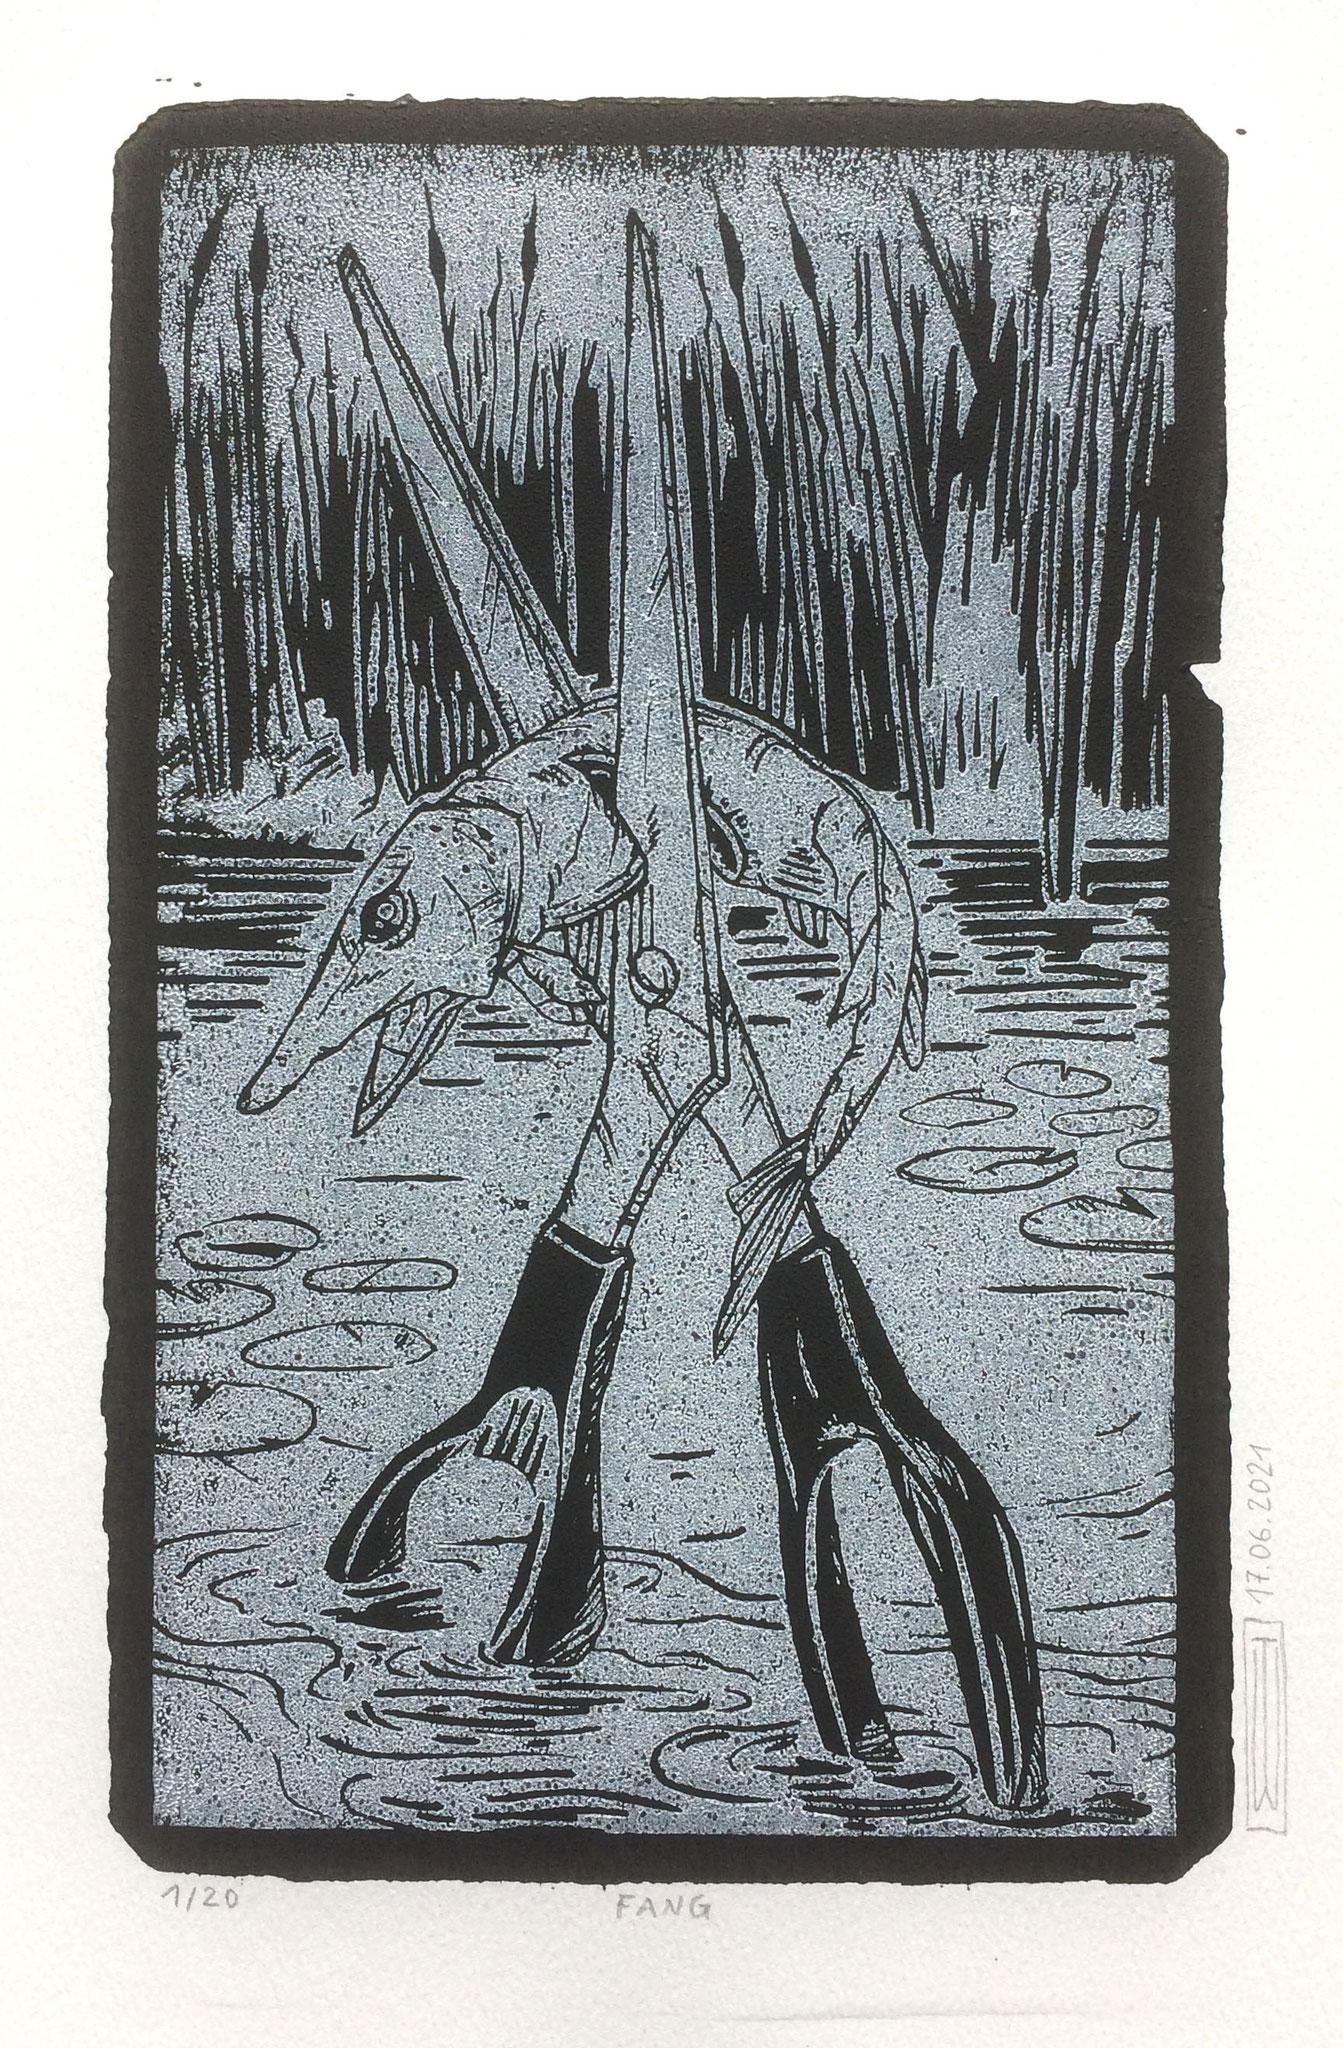 Fang, Linoldruck, 21 x 13 cm